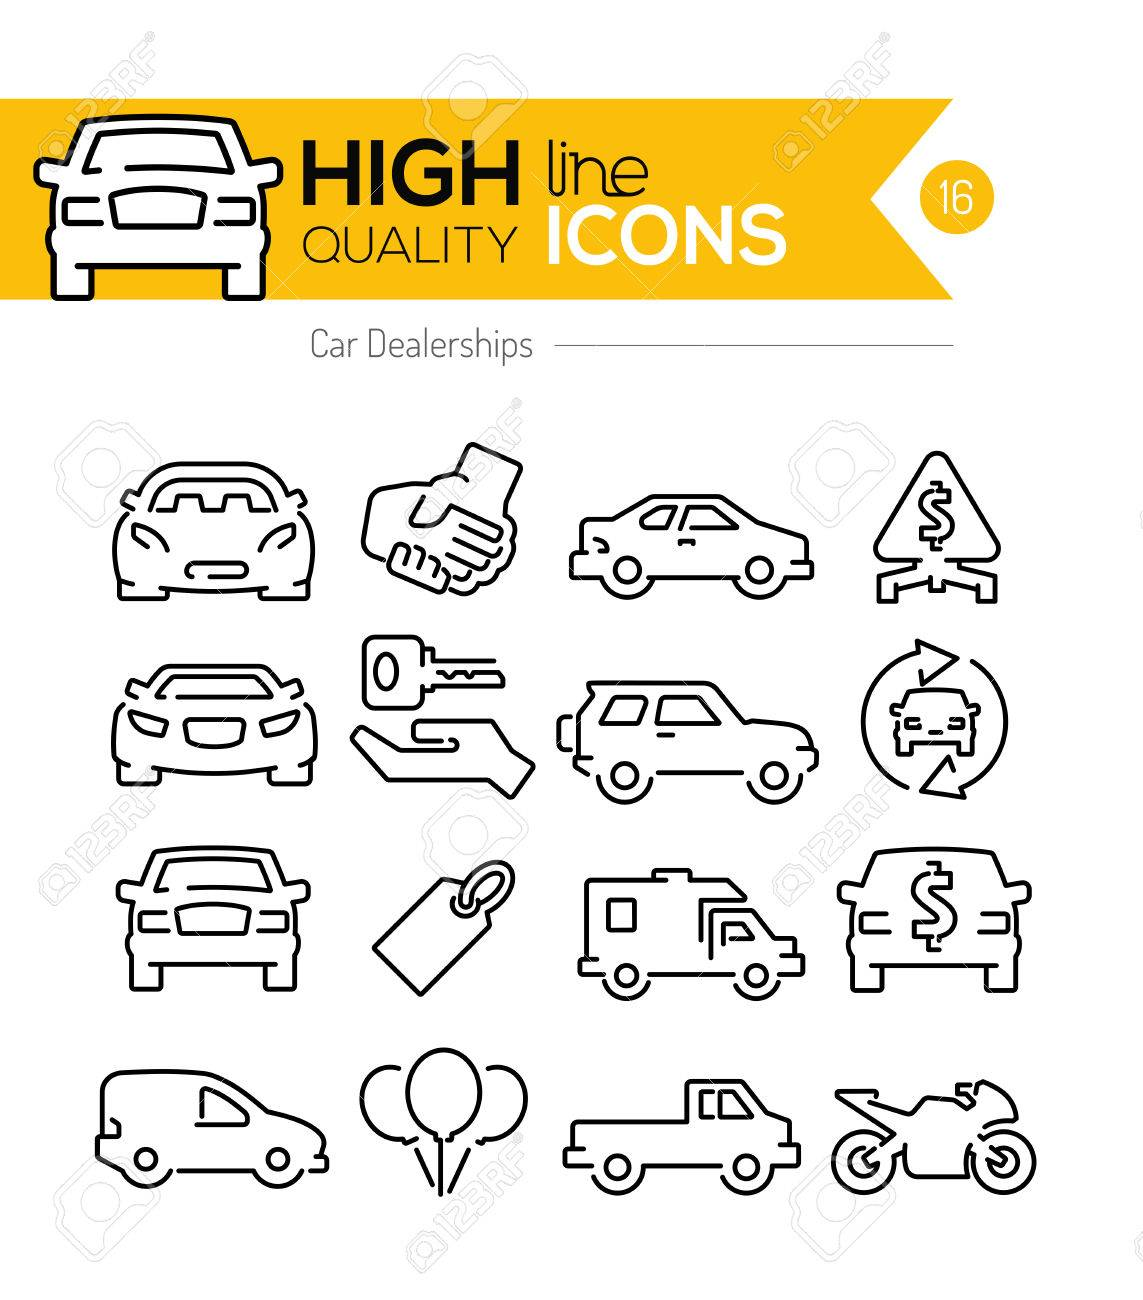 Car Dealerships line icons - 44085799